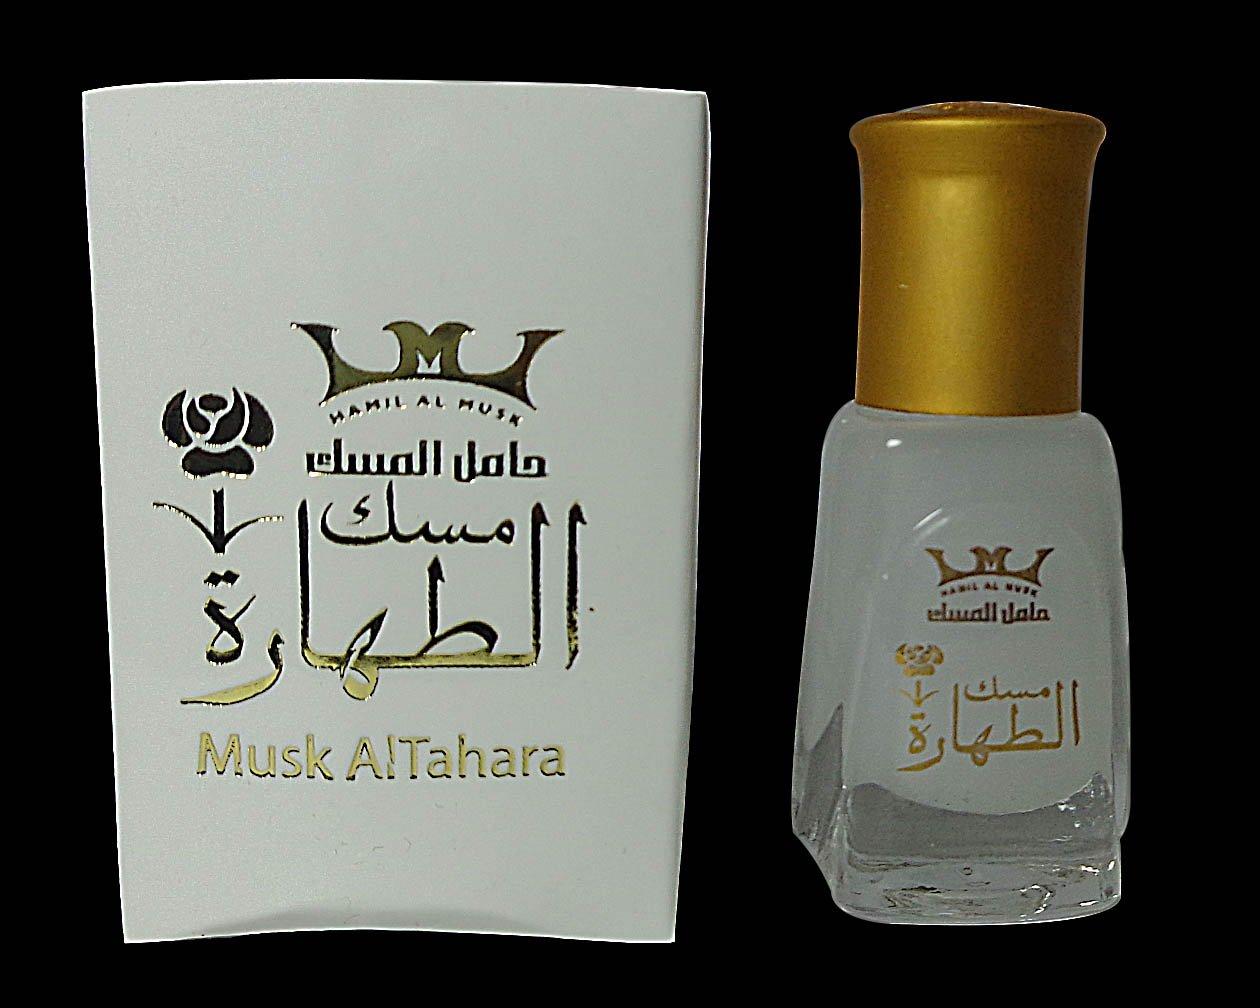 Pure Saudi Arabian Musk Al tahara Altahara Alcohol Free 5ml مسك أبيــض درجة أولى (12 Bottle = 60 ml)